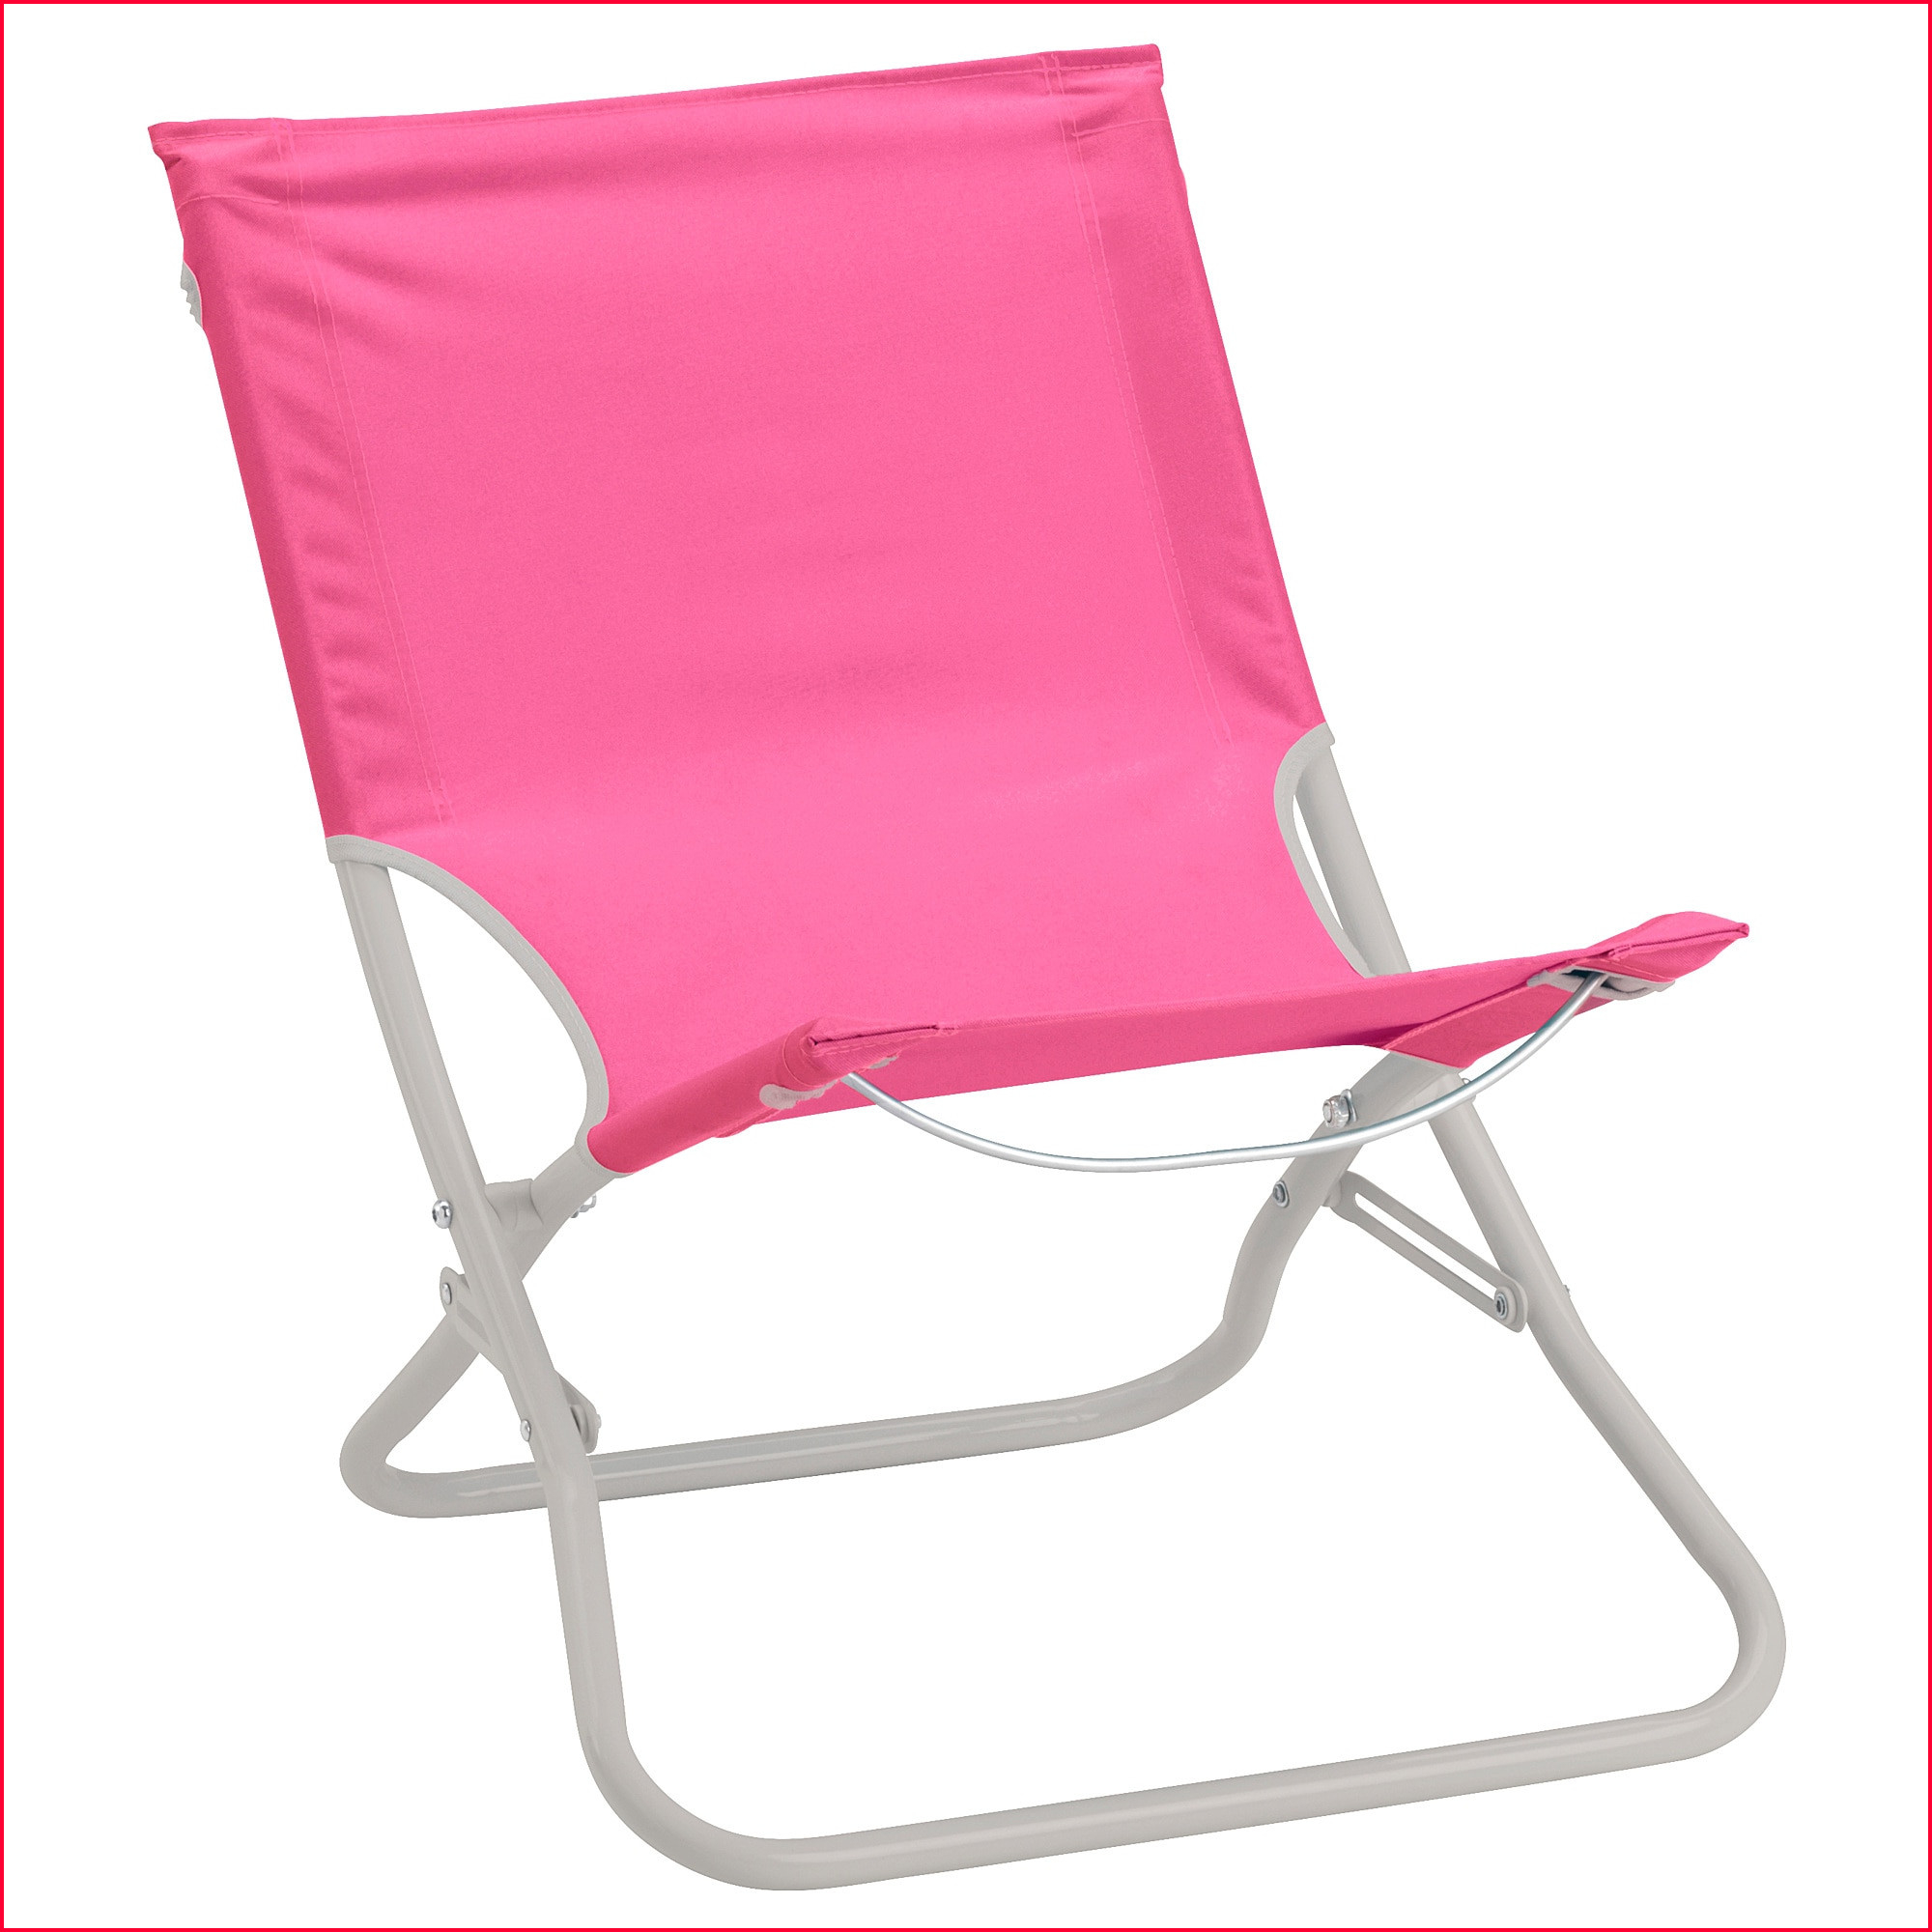 Sillas Playa Ikea Tldn Silla Playa Plegable H M Silla De Playa Rosa